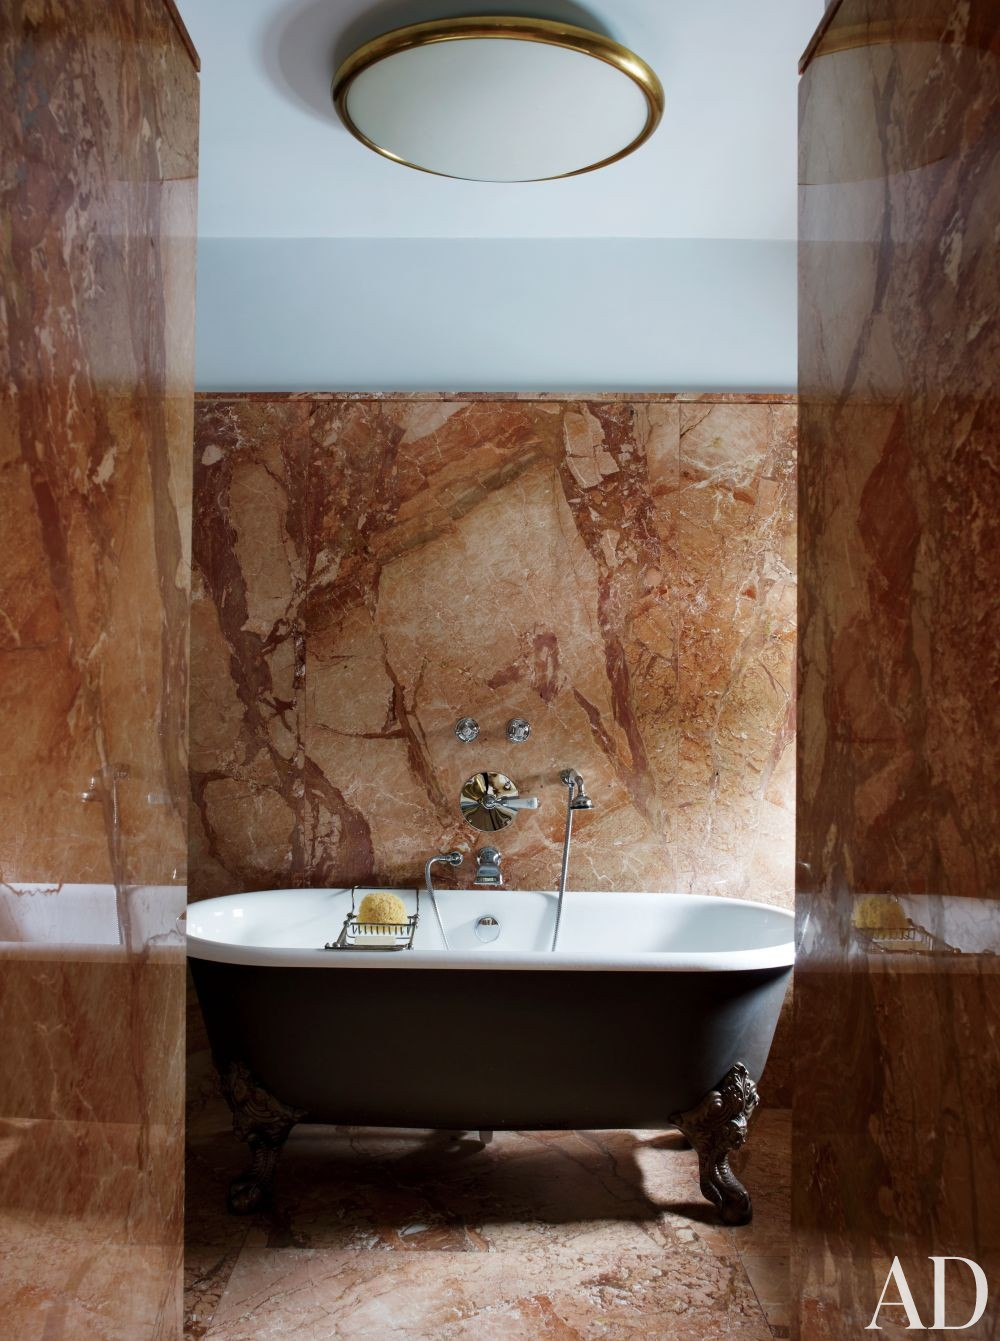 Contemporary Bathroom by Rafael de Cárdenas Ltd./Architecture at Large in London, England